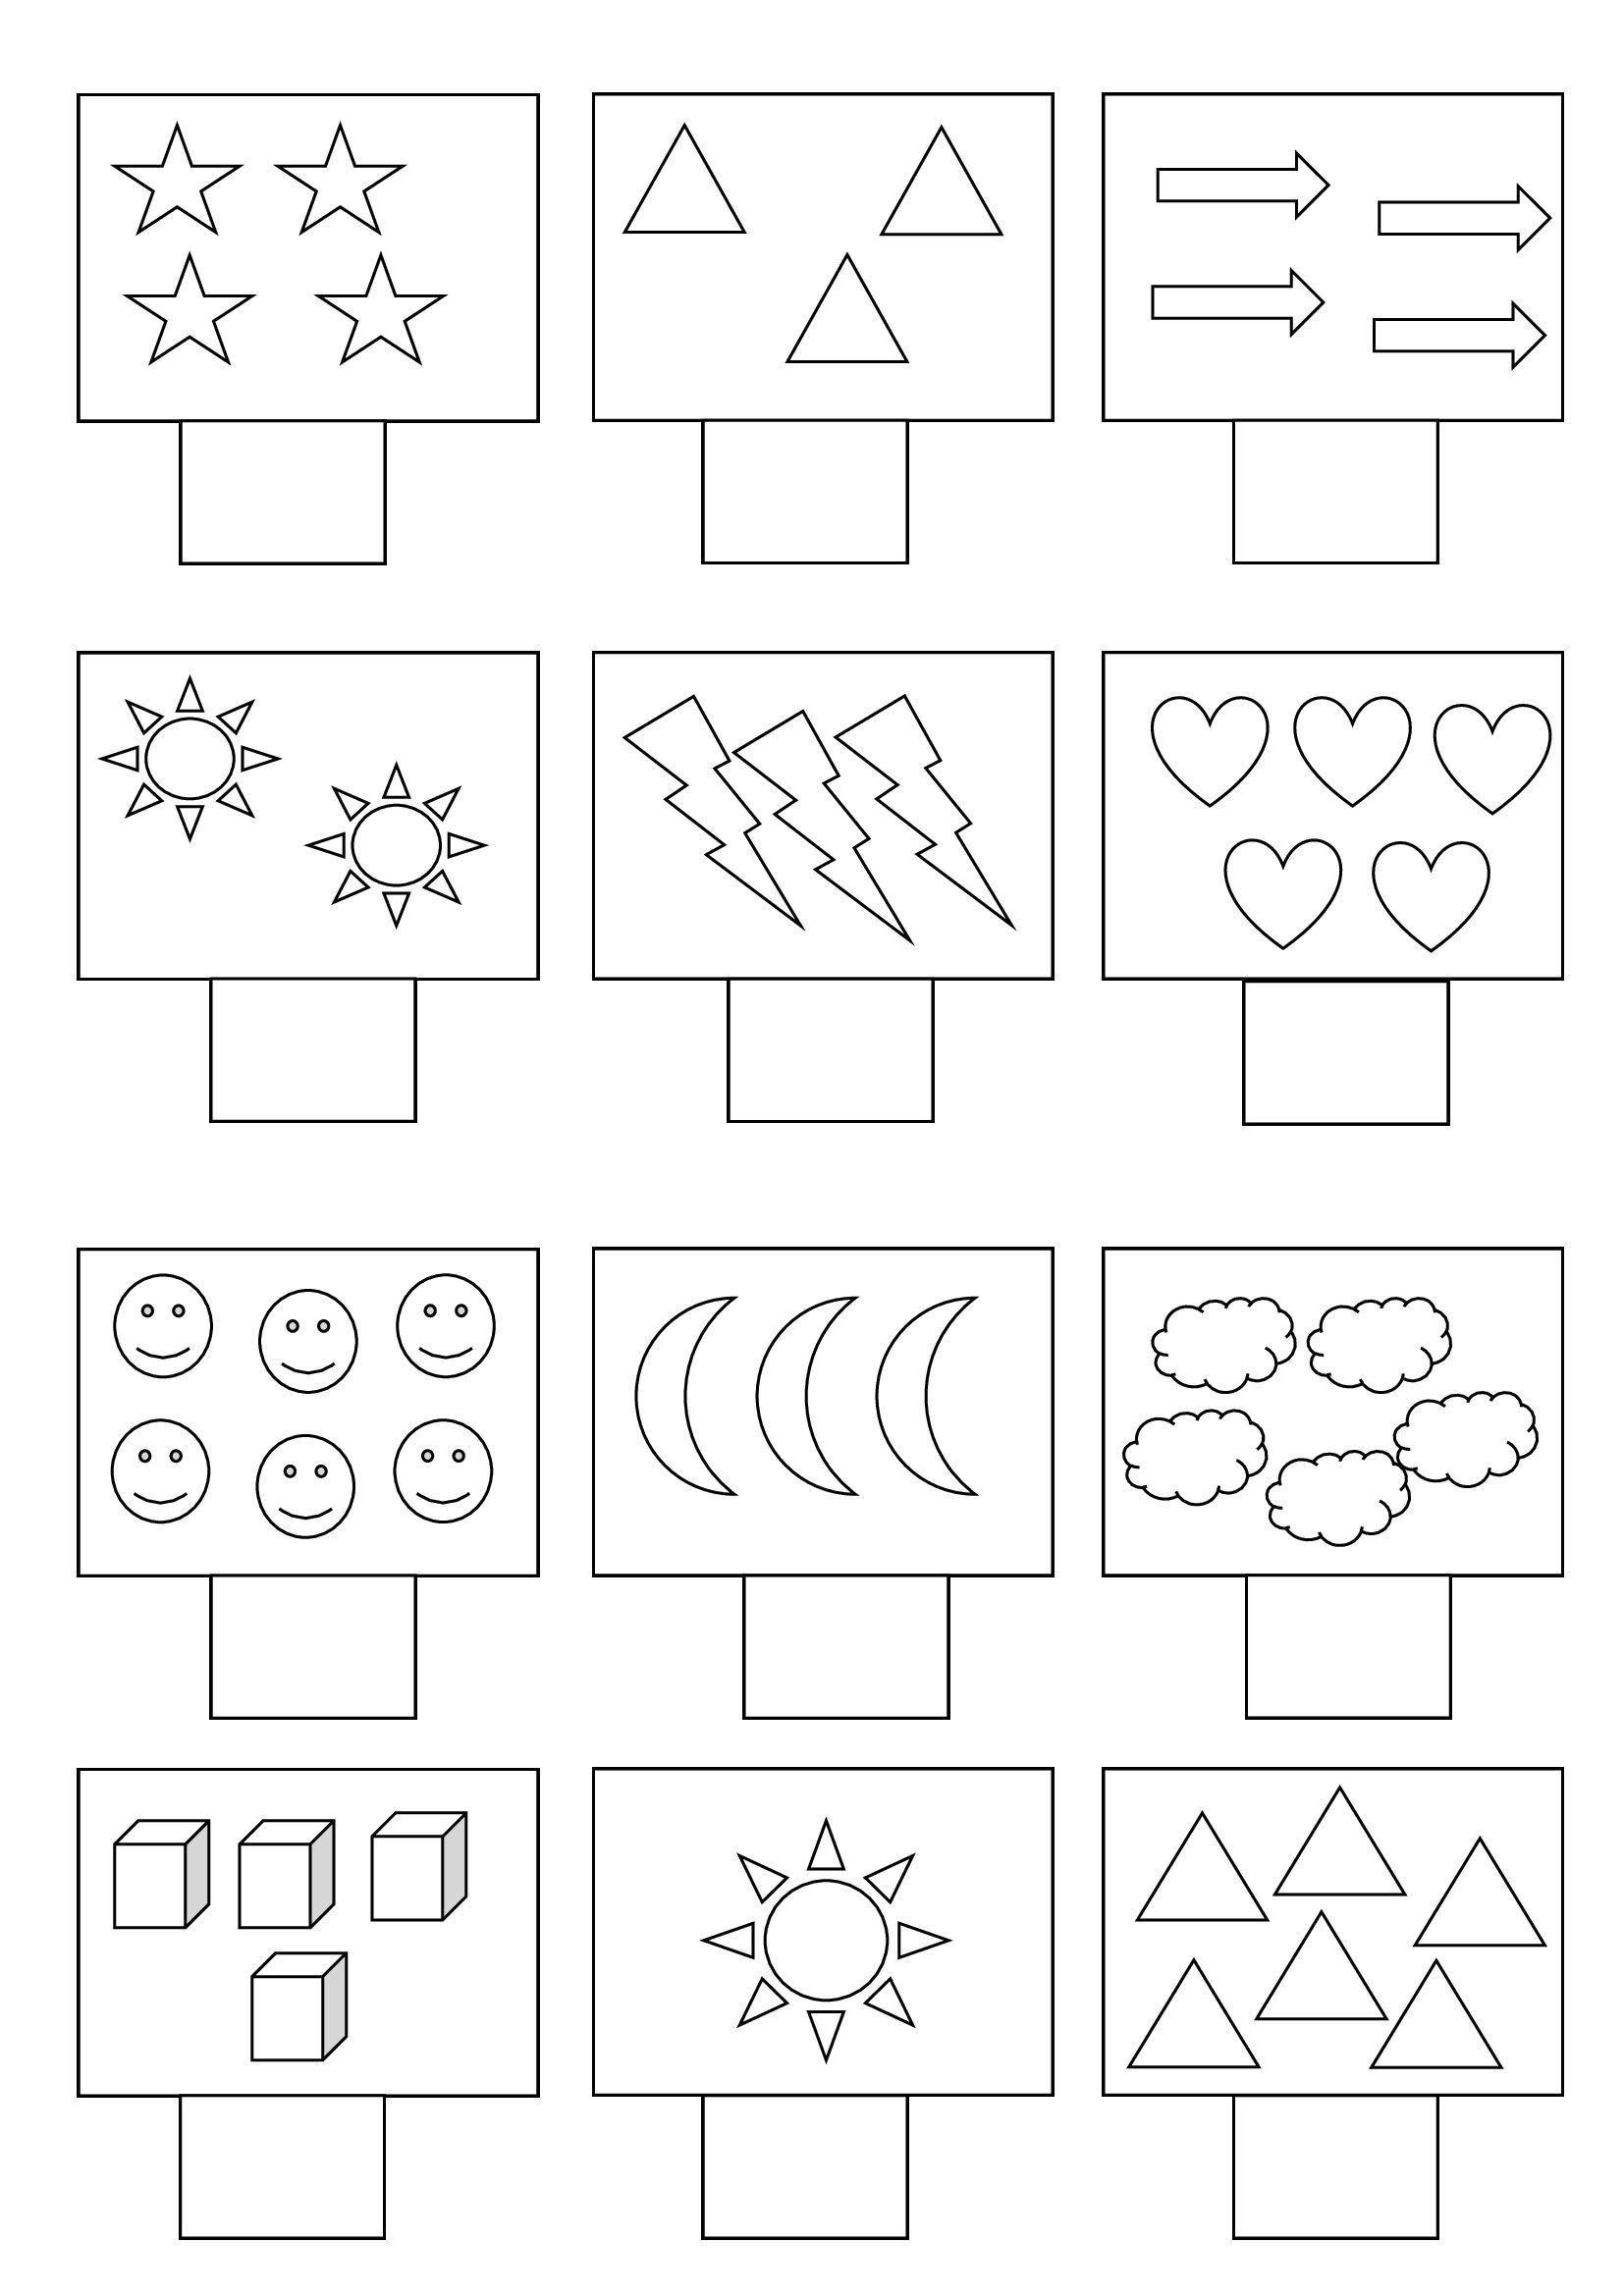 3 Kumon Worksheets Free Em Com Imagens